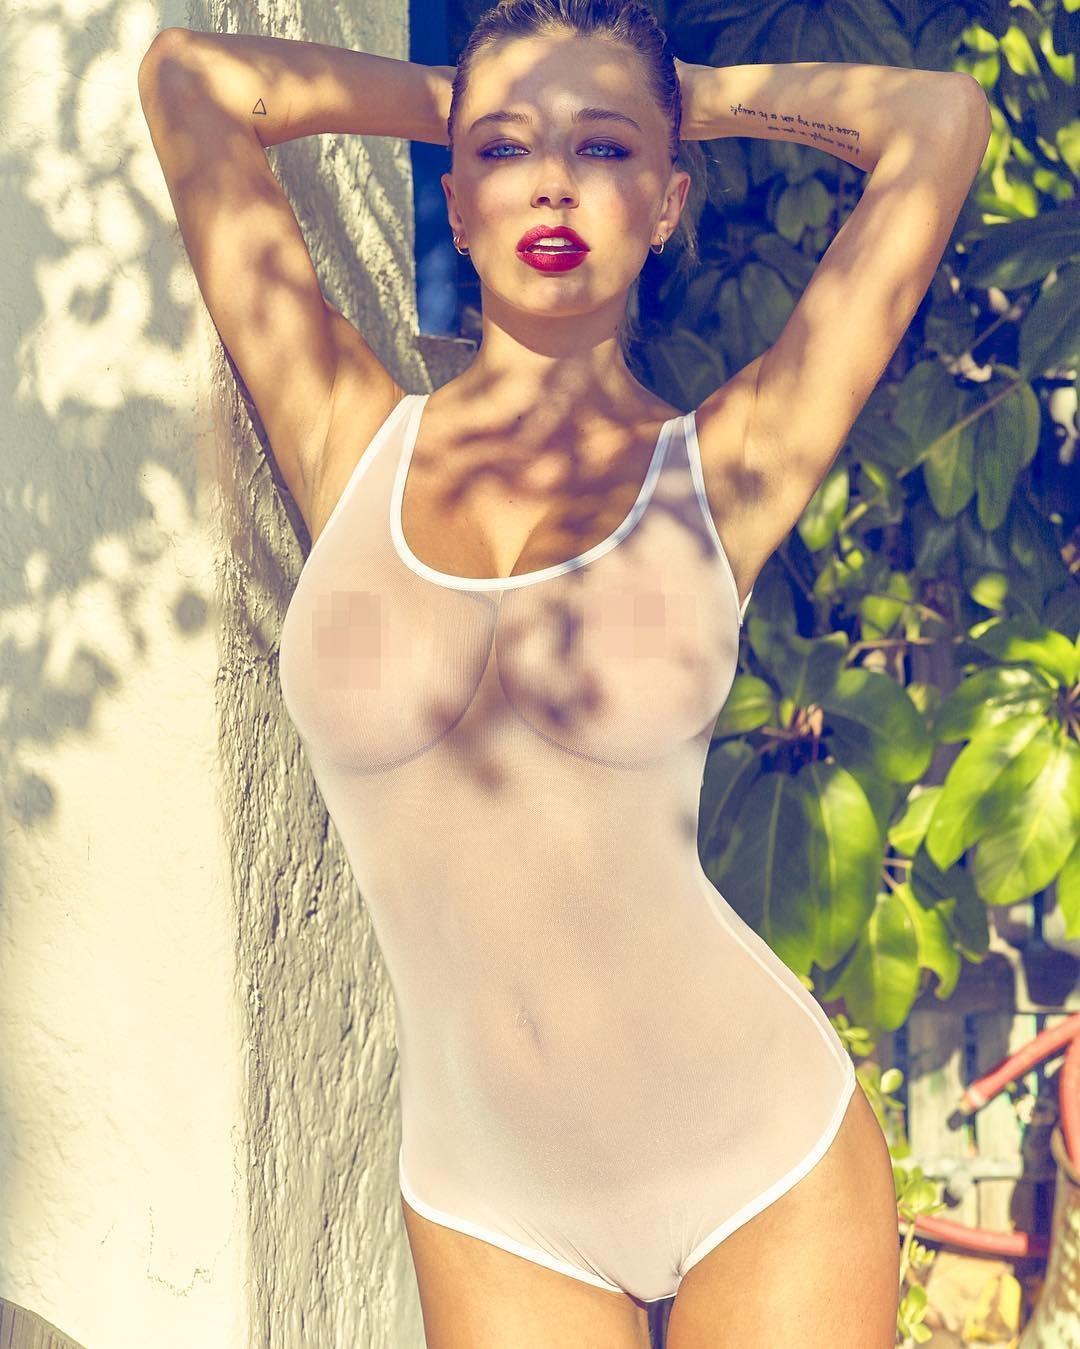 Caroline Vreeland Desnuda Página 6 Fotos Desnuda Descuido